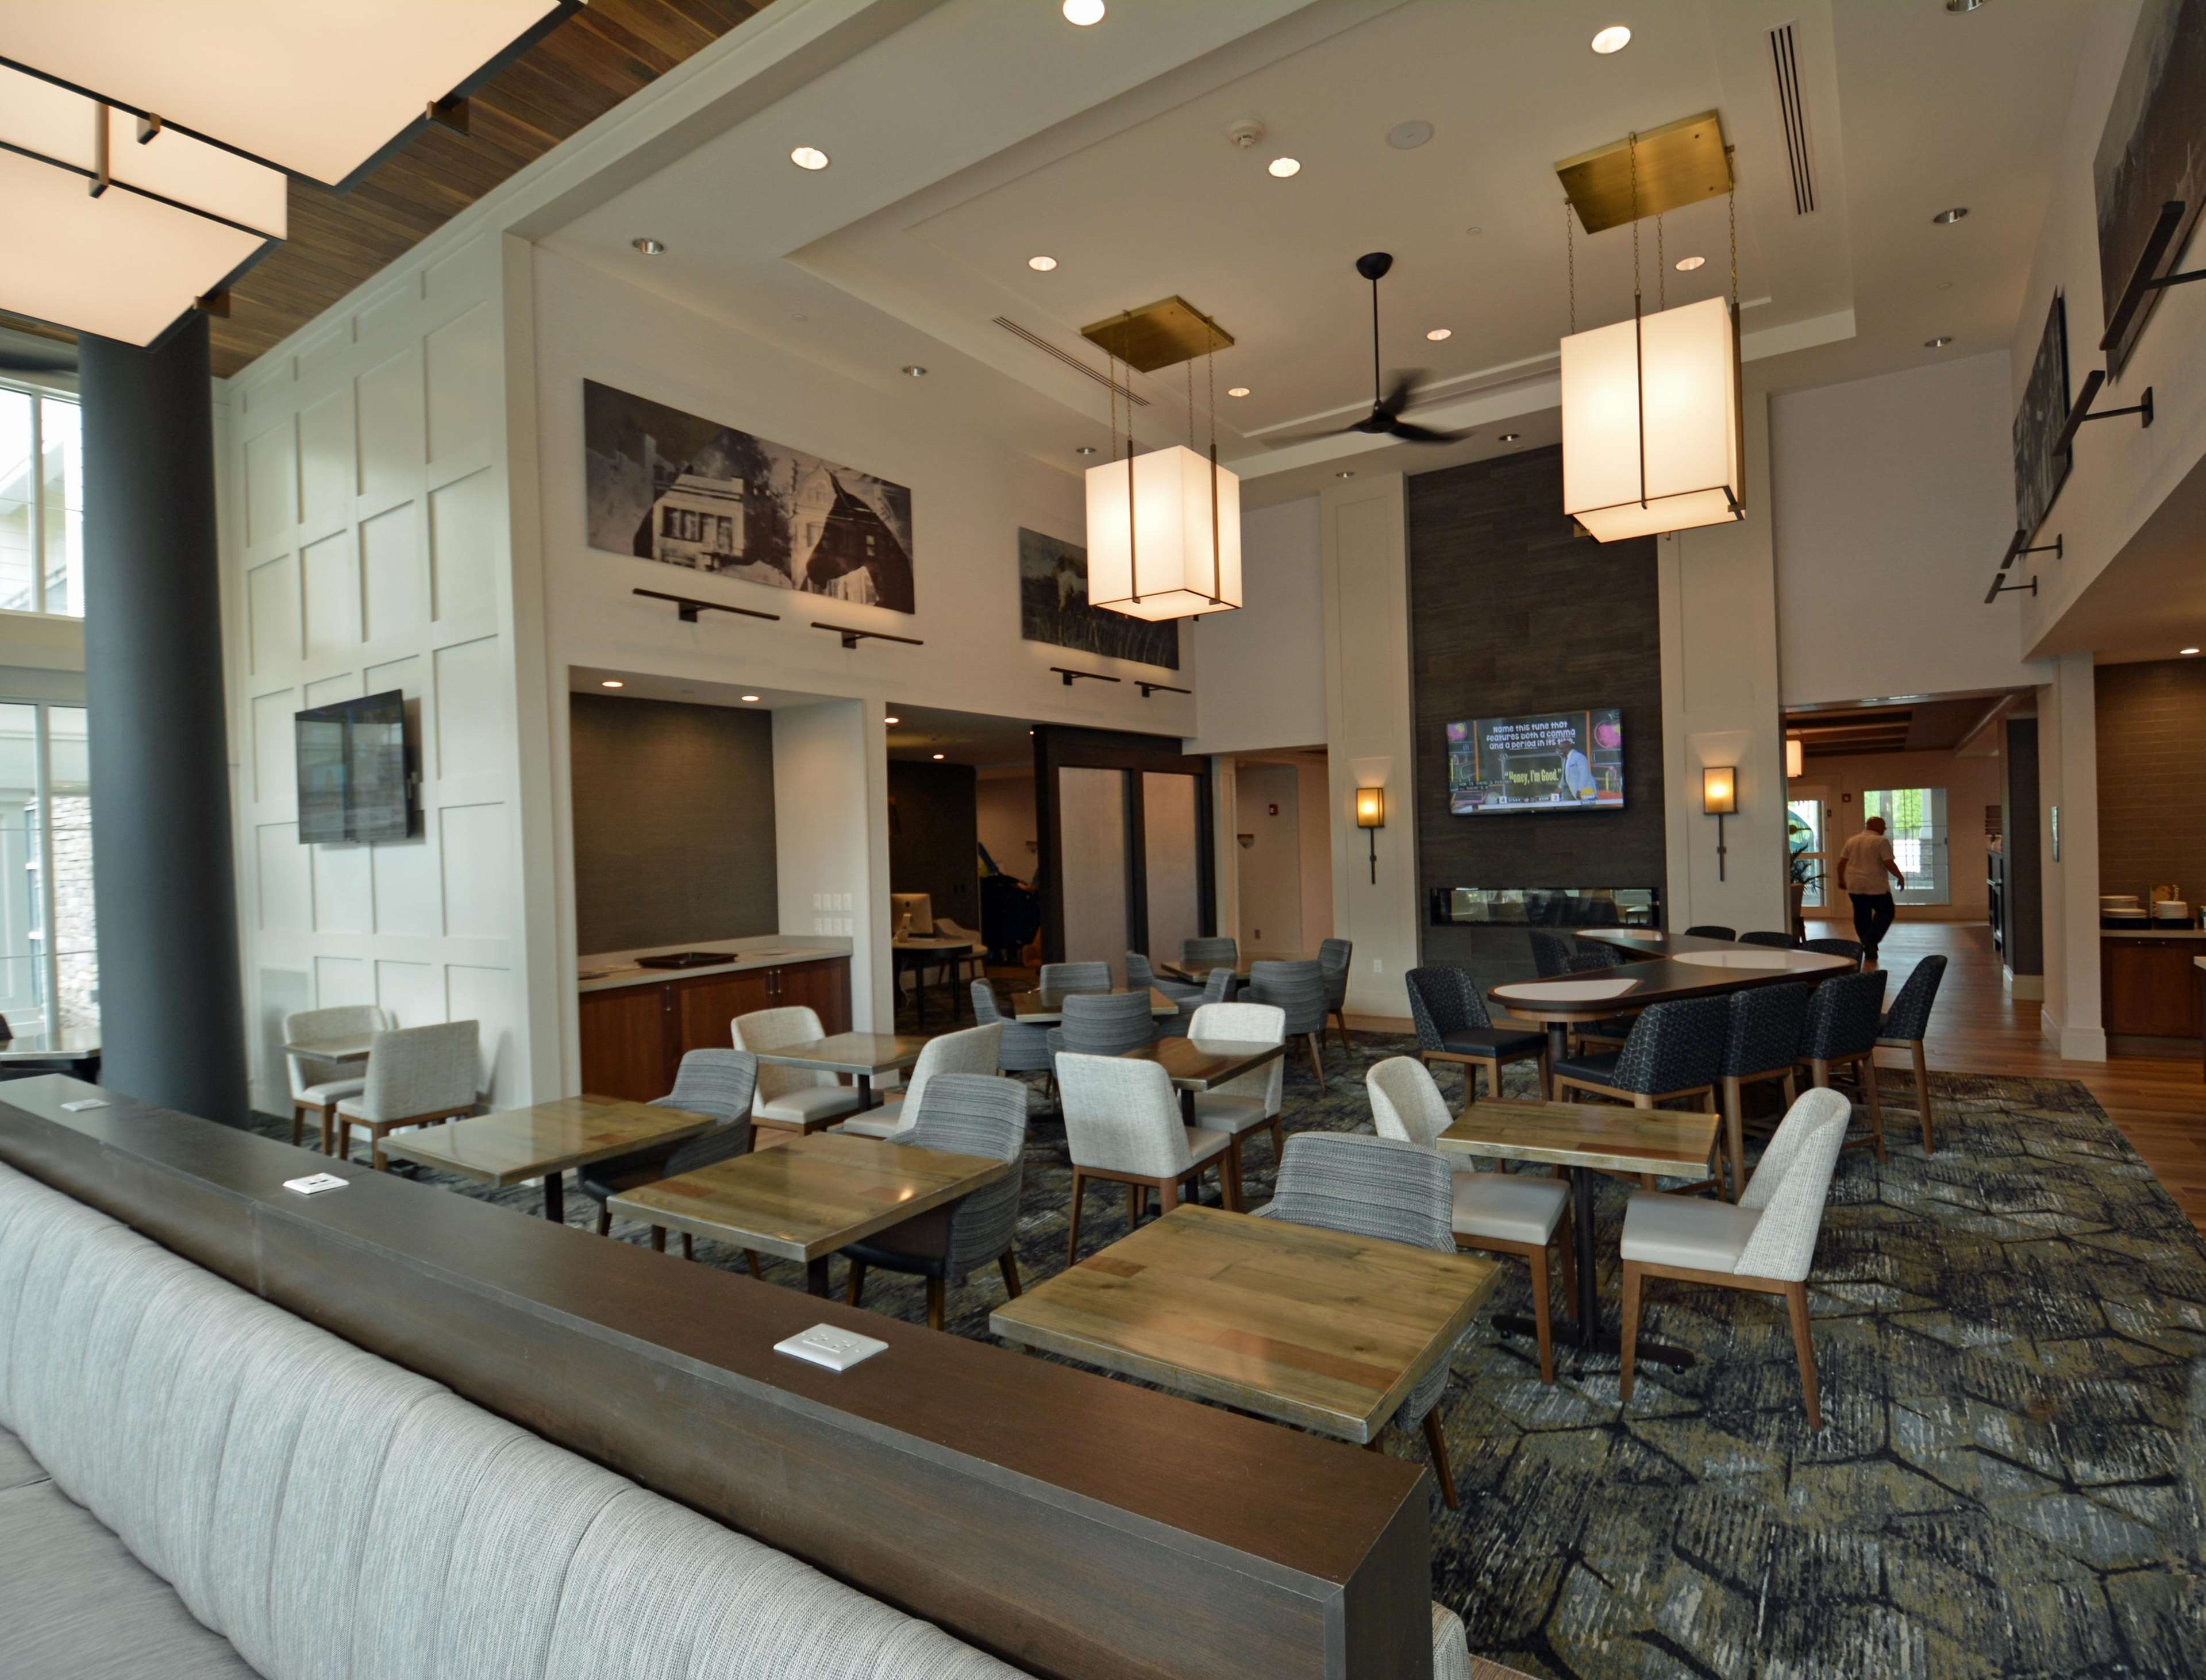 Homewood Suites by Hilton Saratoga Springs image 1